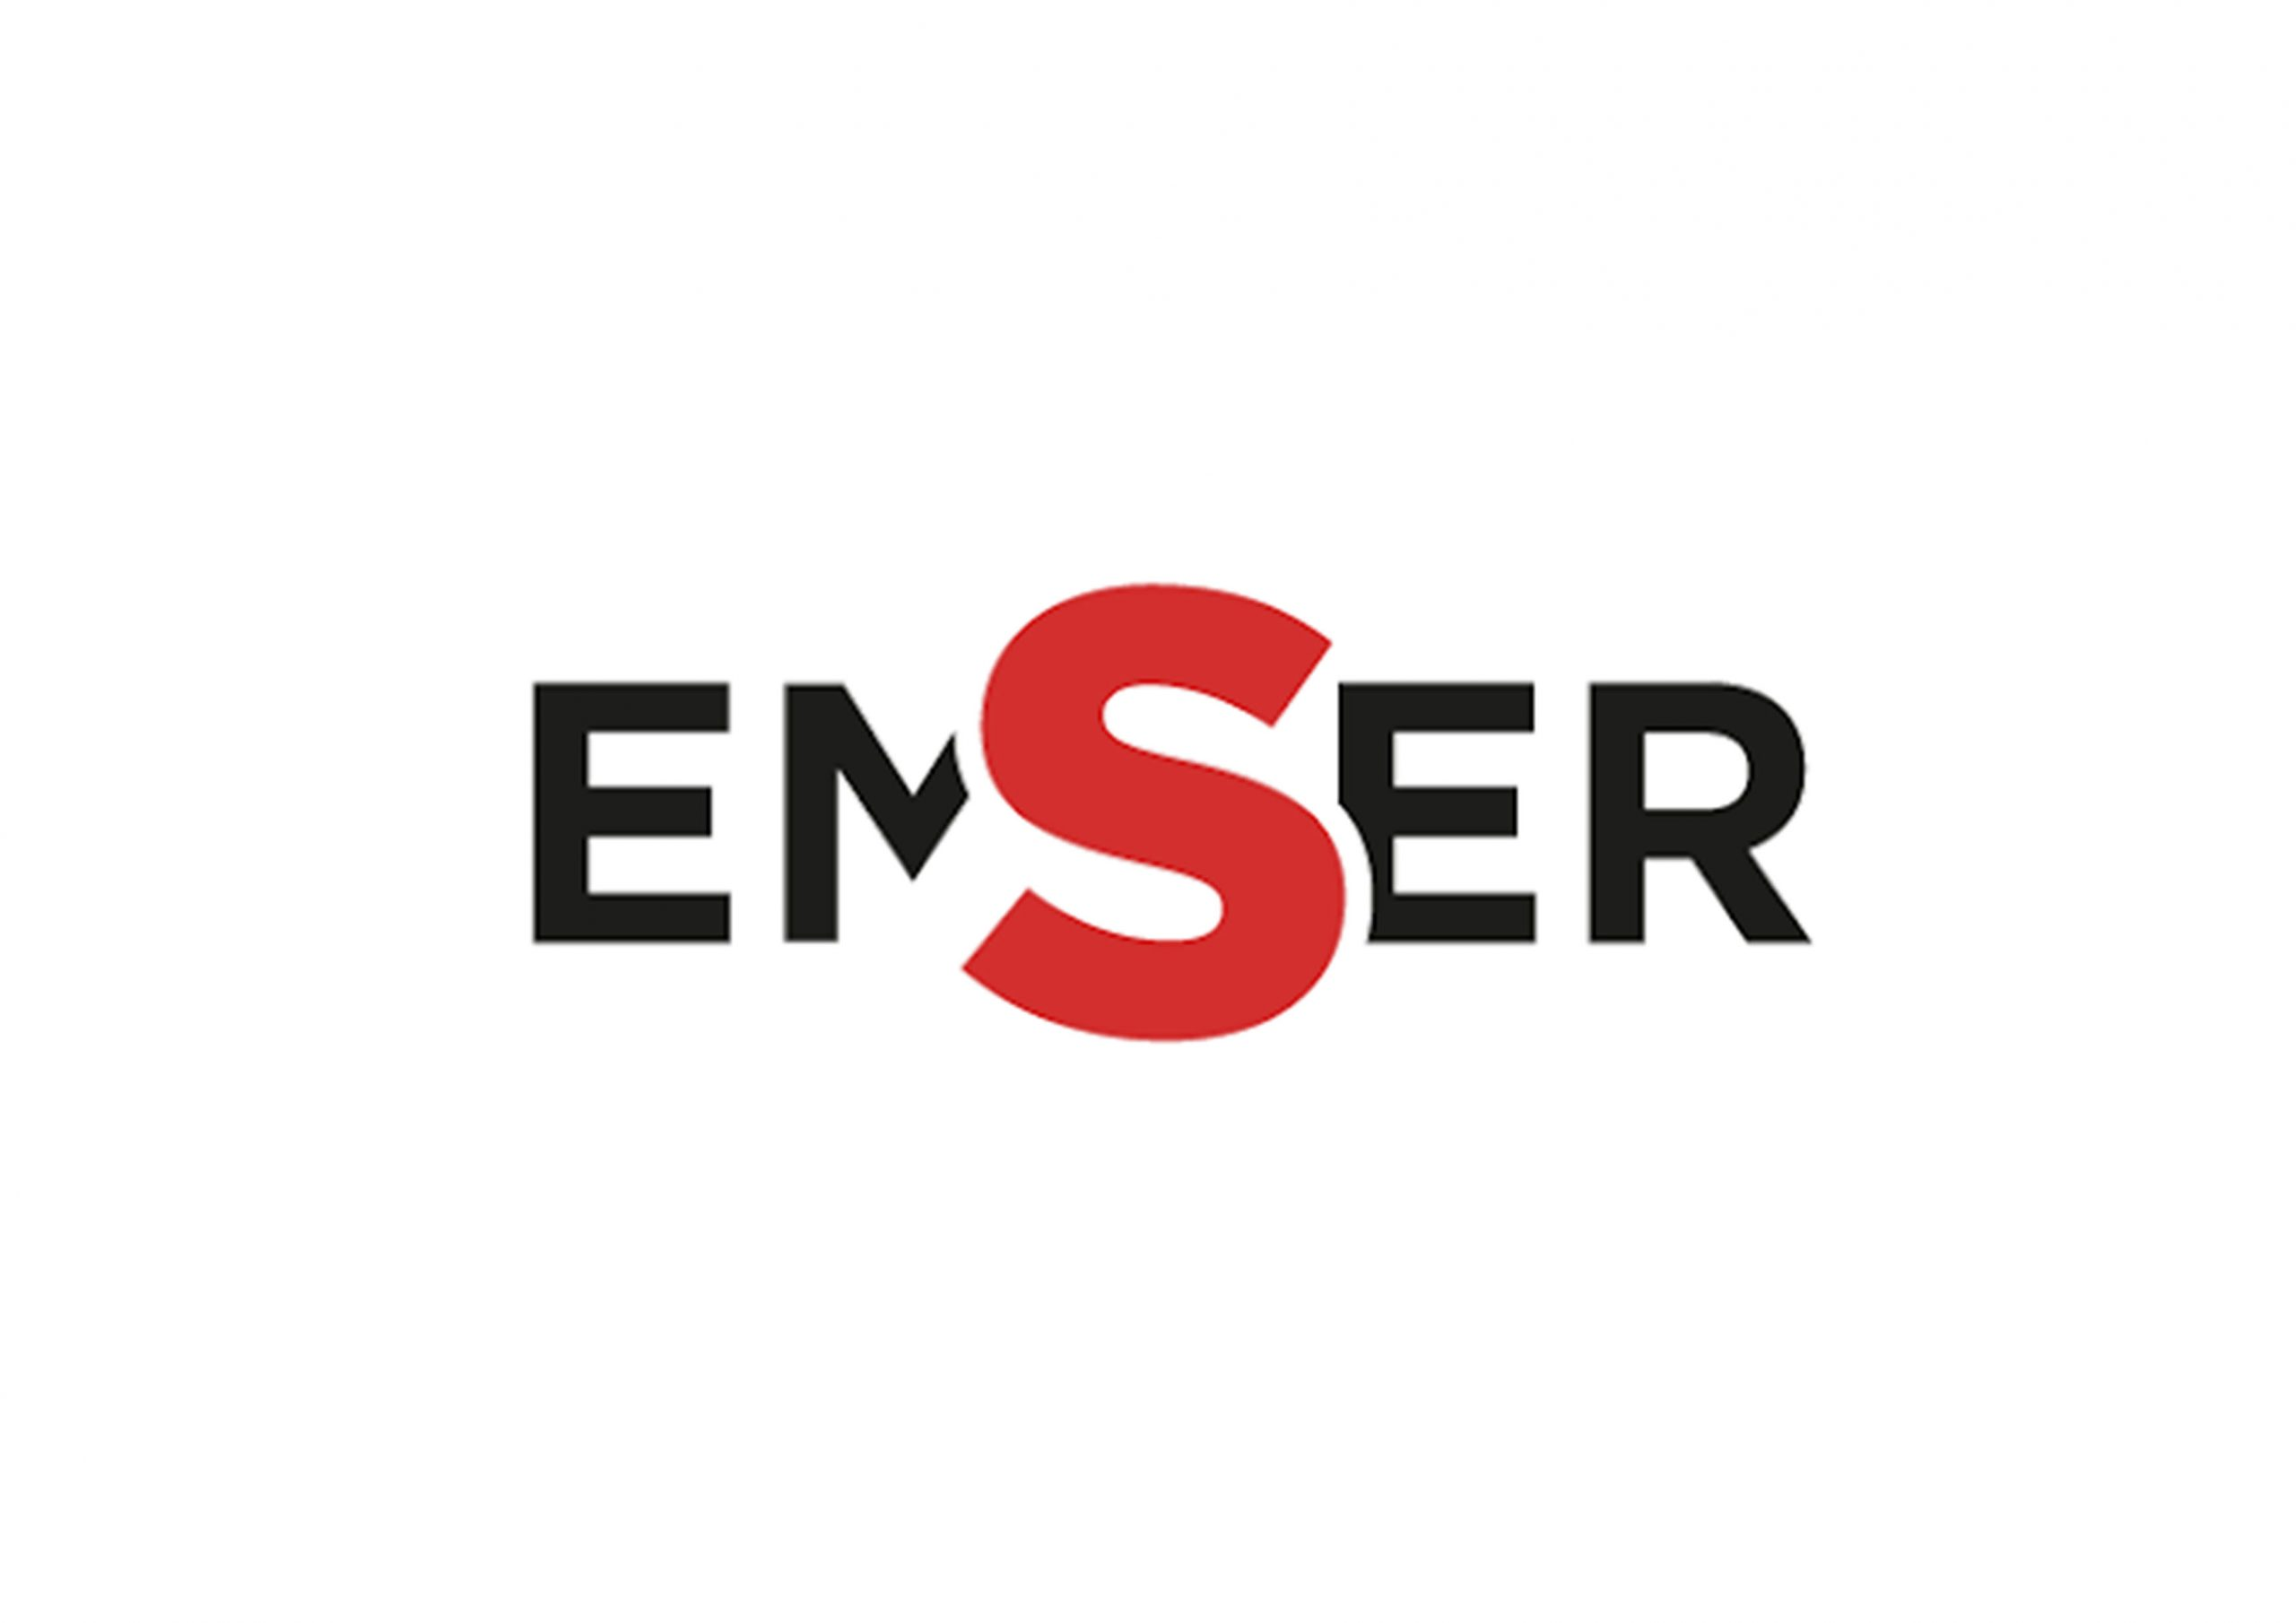 emser-jpeg-scaled